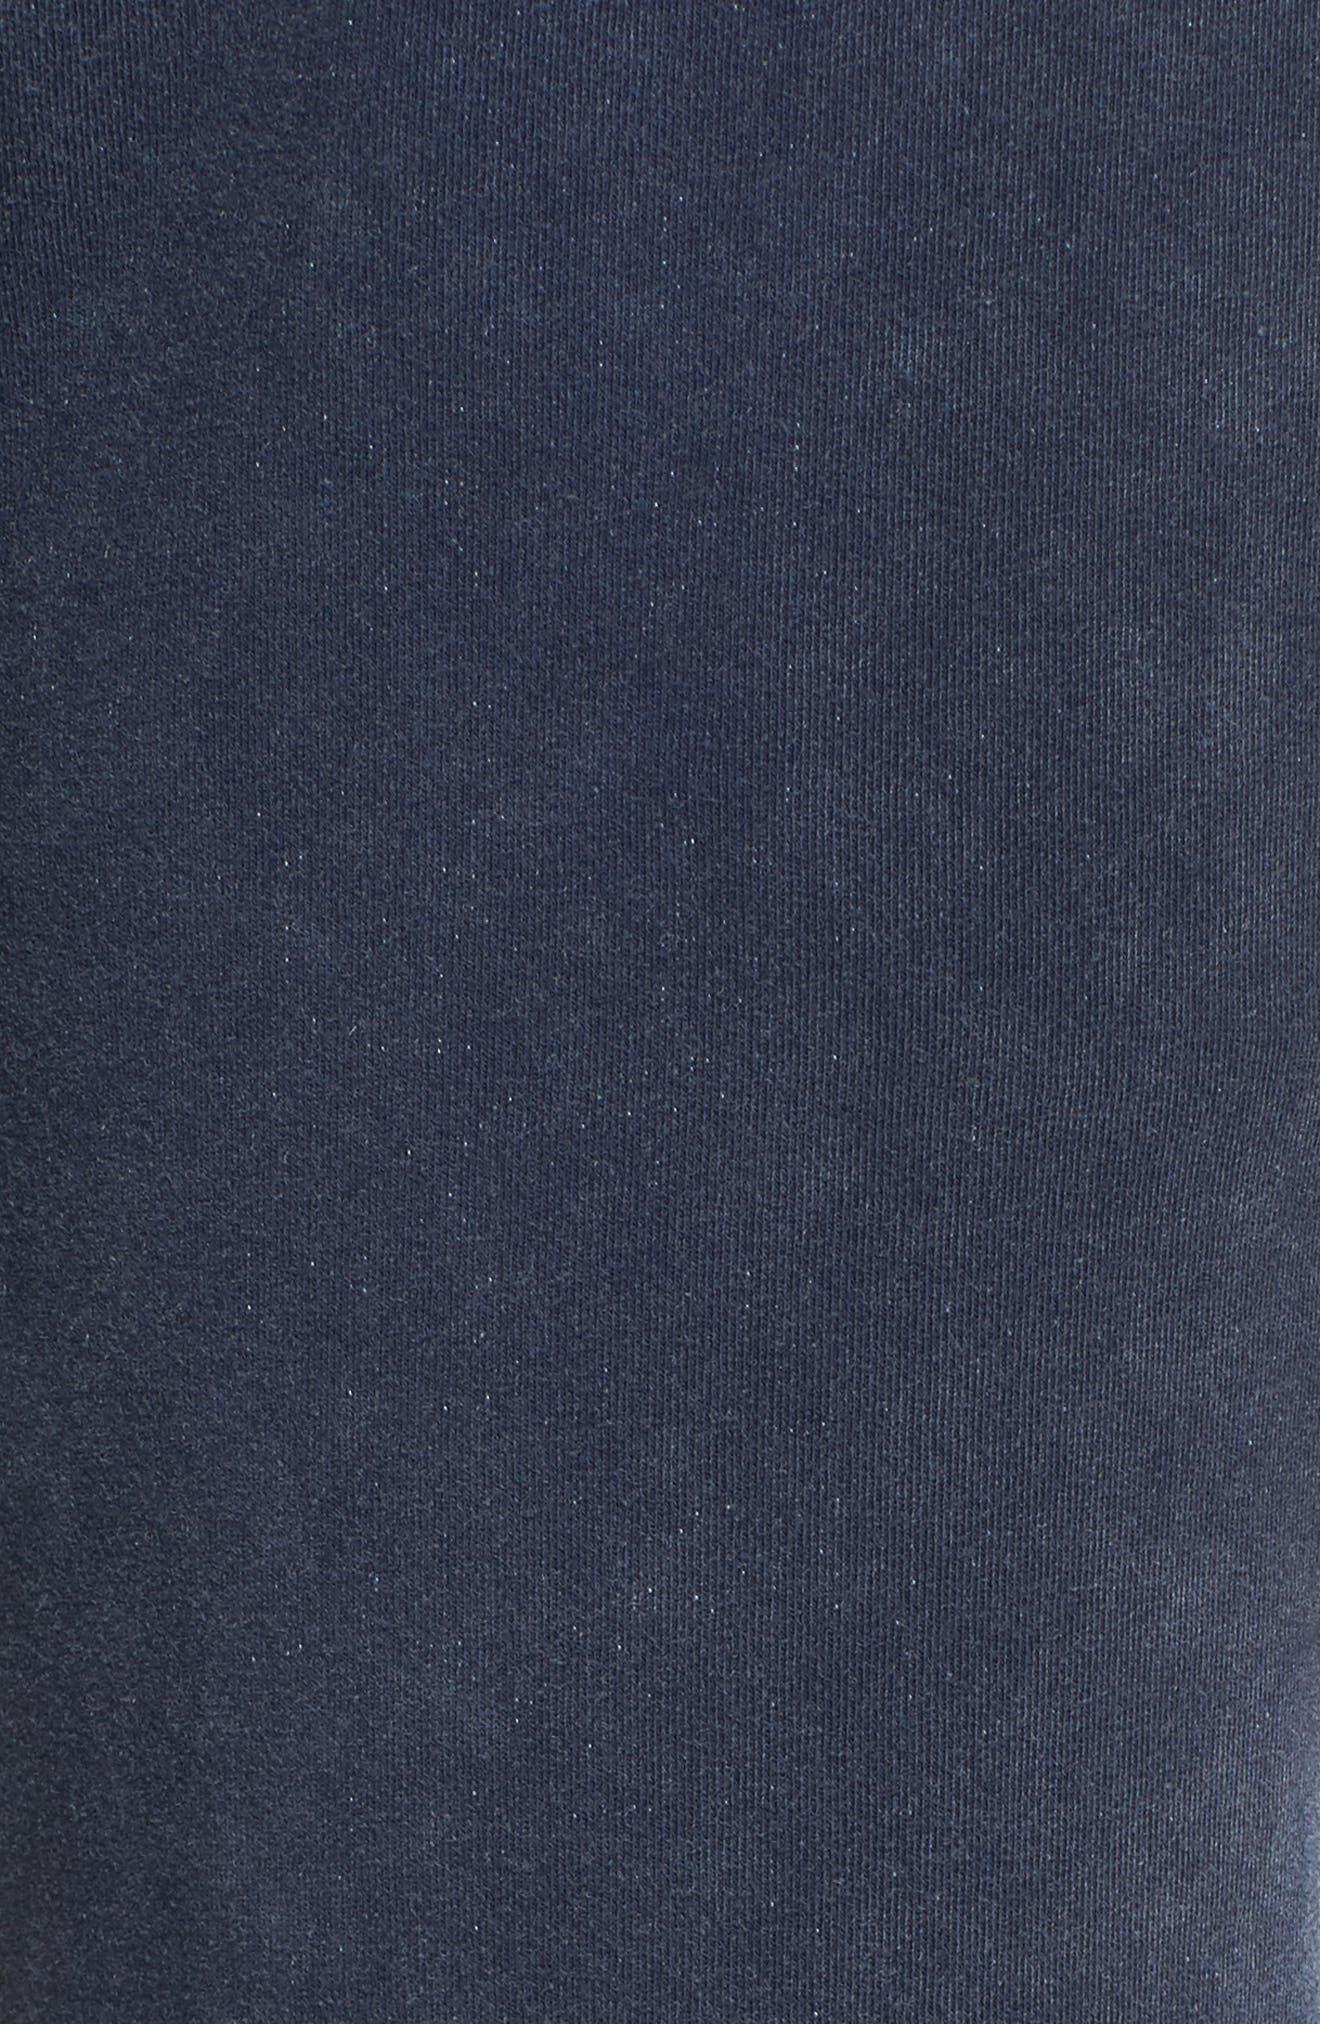 Lounge Pants,                             Alternate thumbnail 6, color,                             Indigo